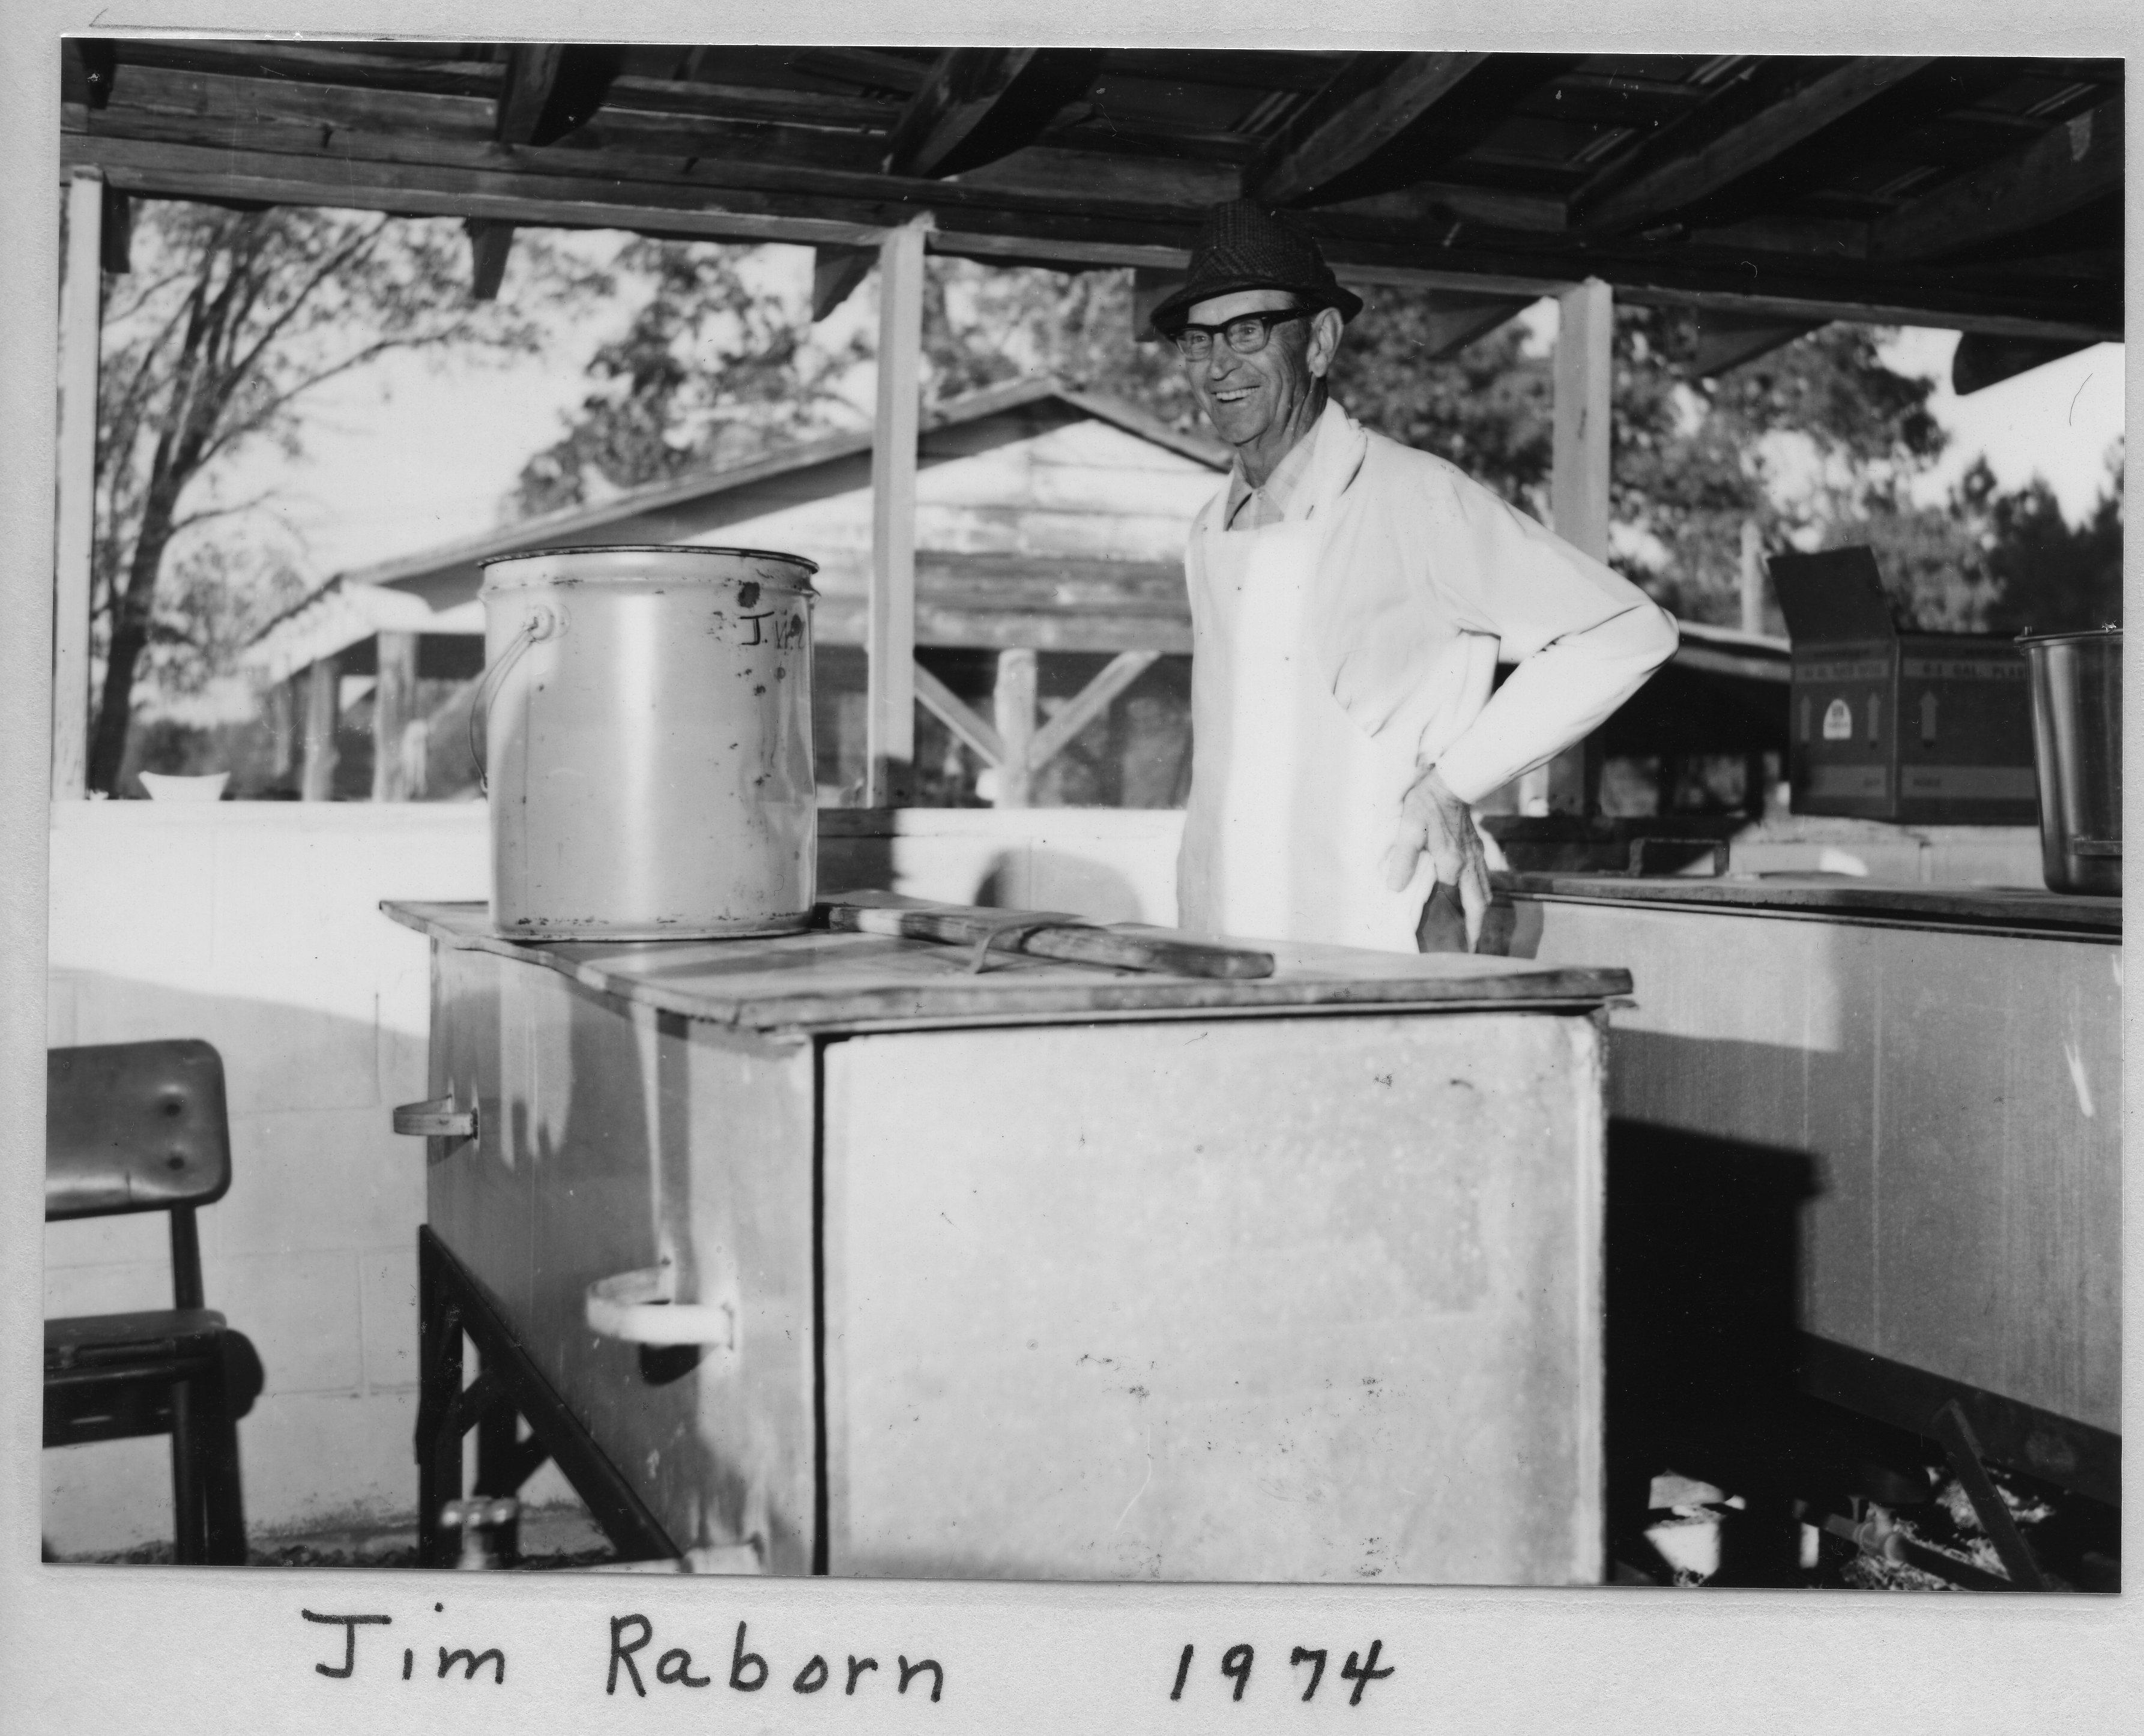 Jim Raborn Coffee Maker